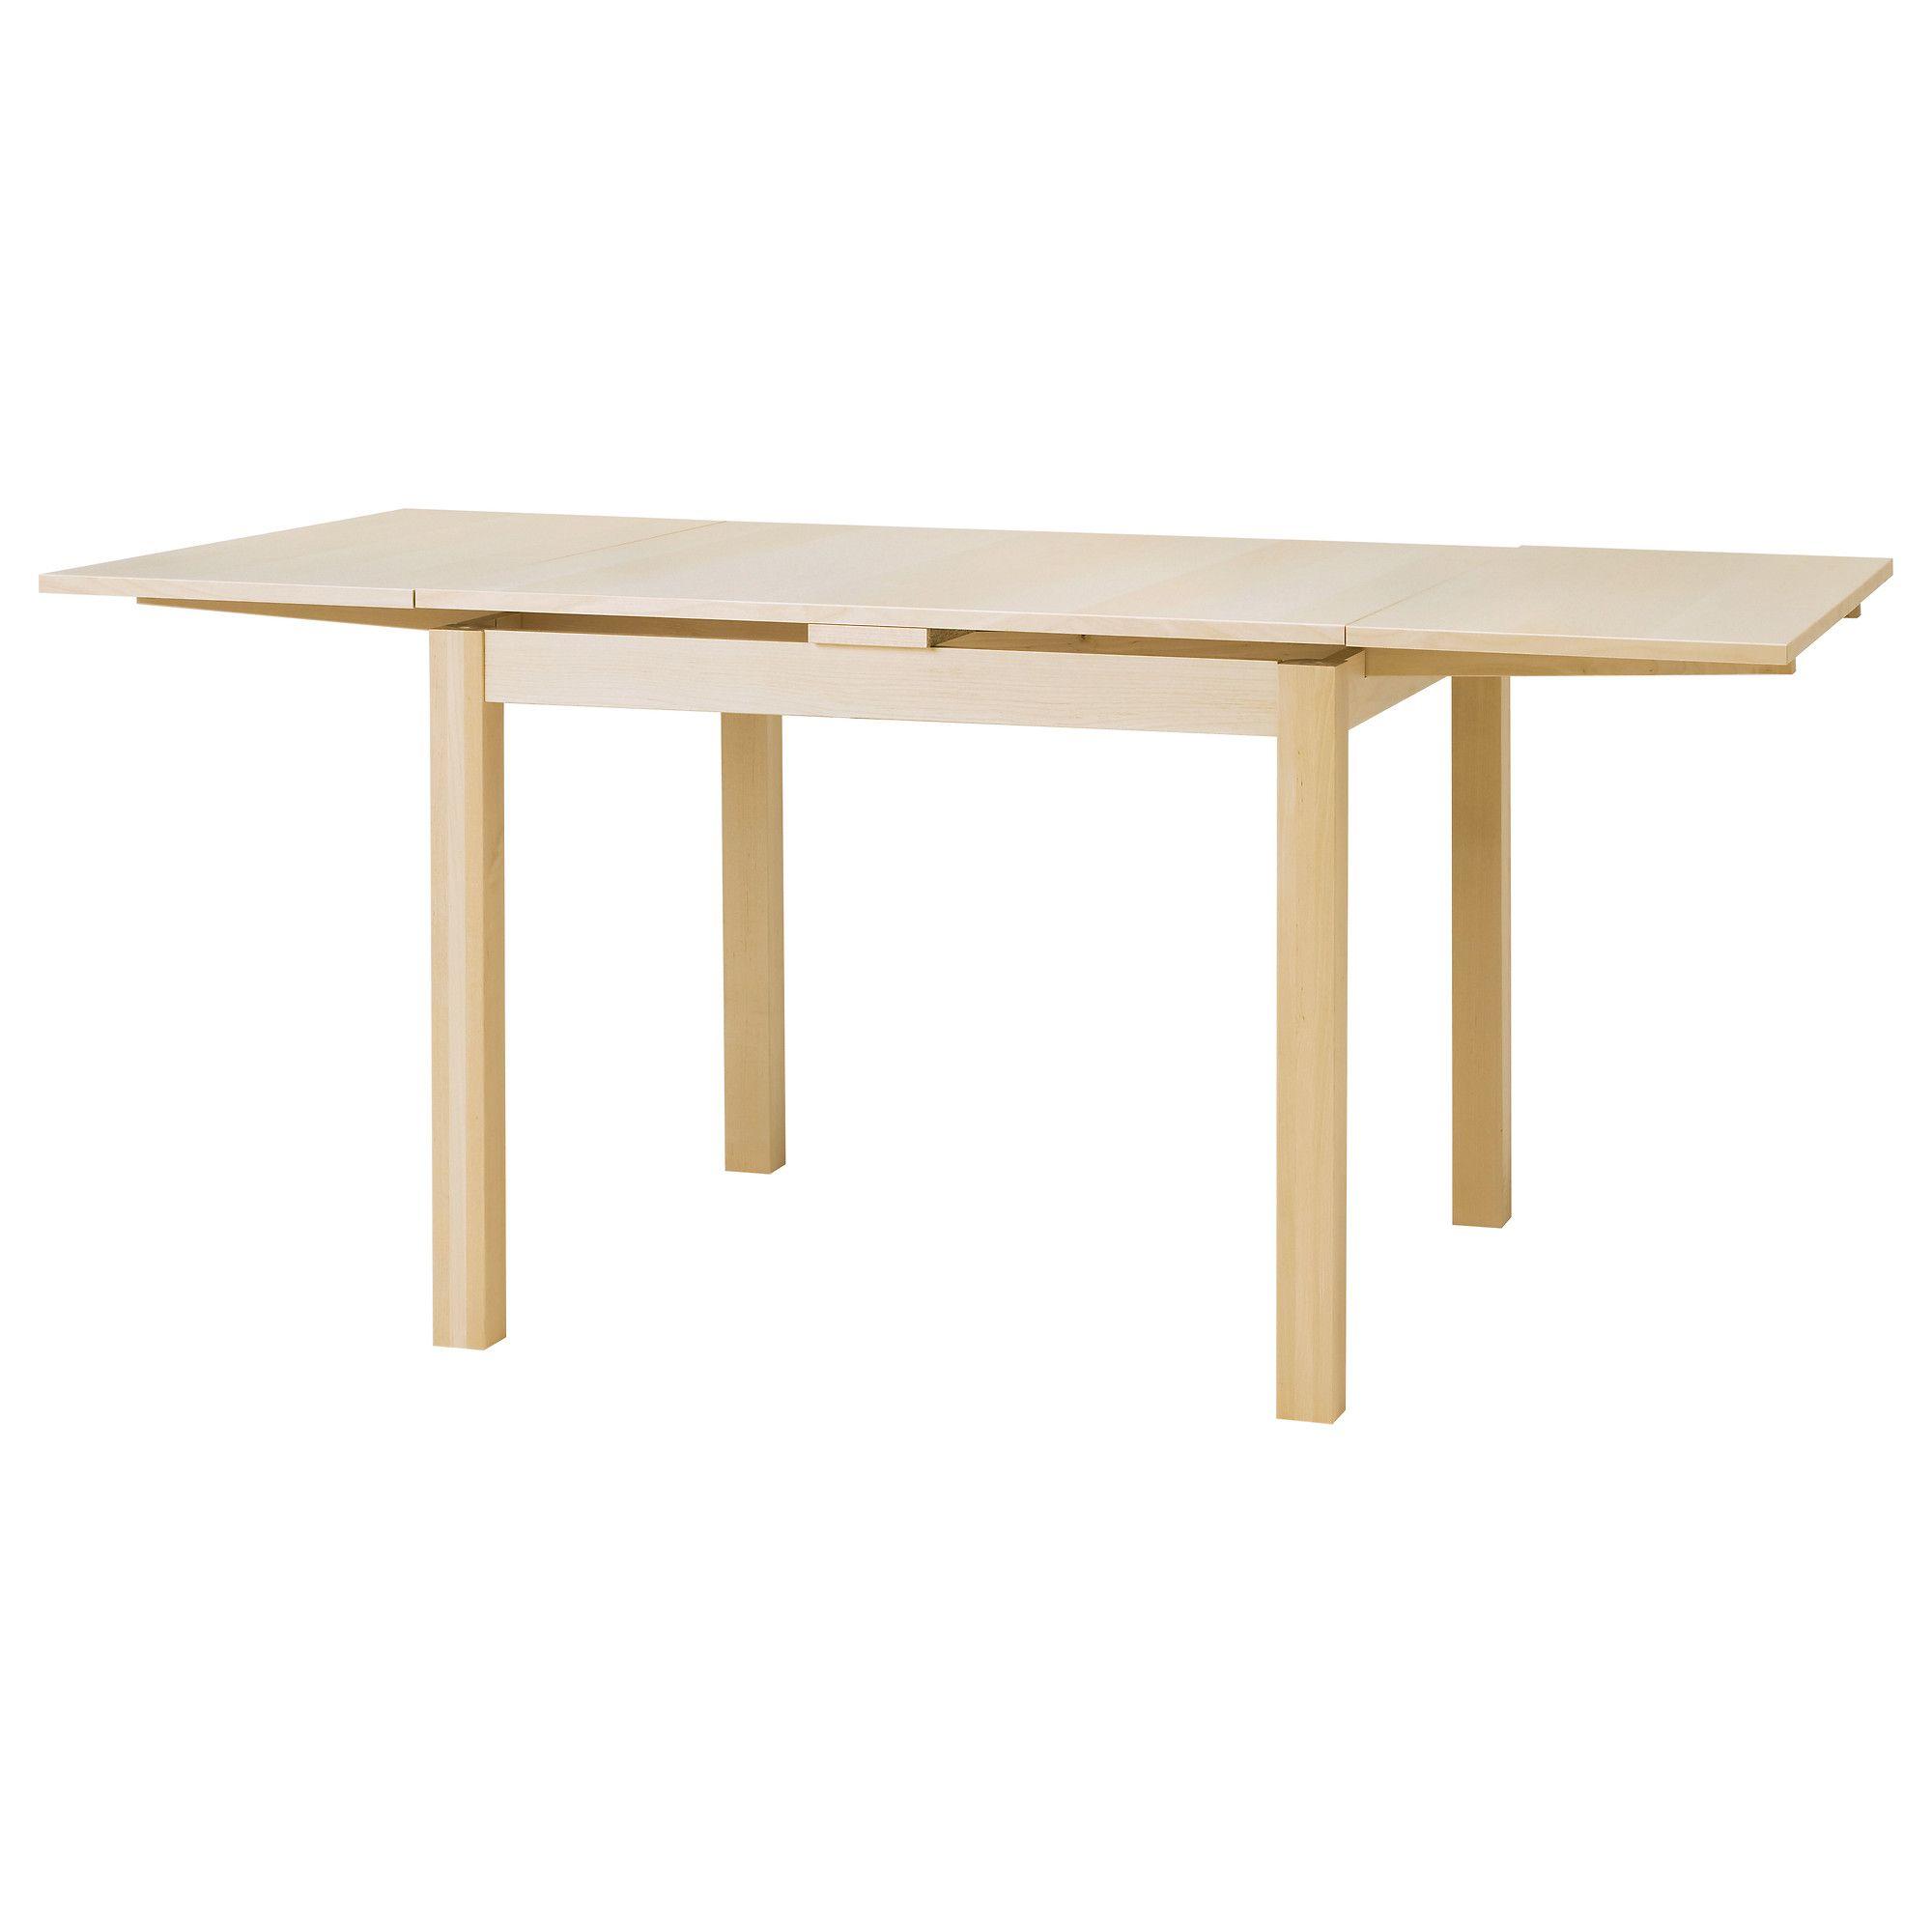 Bjursta Extendable Table Ikea As Wells As Bjursta Extendable Table